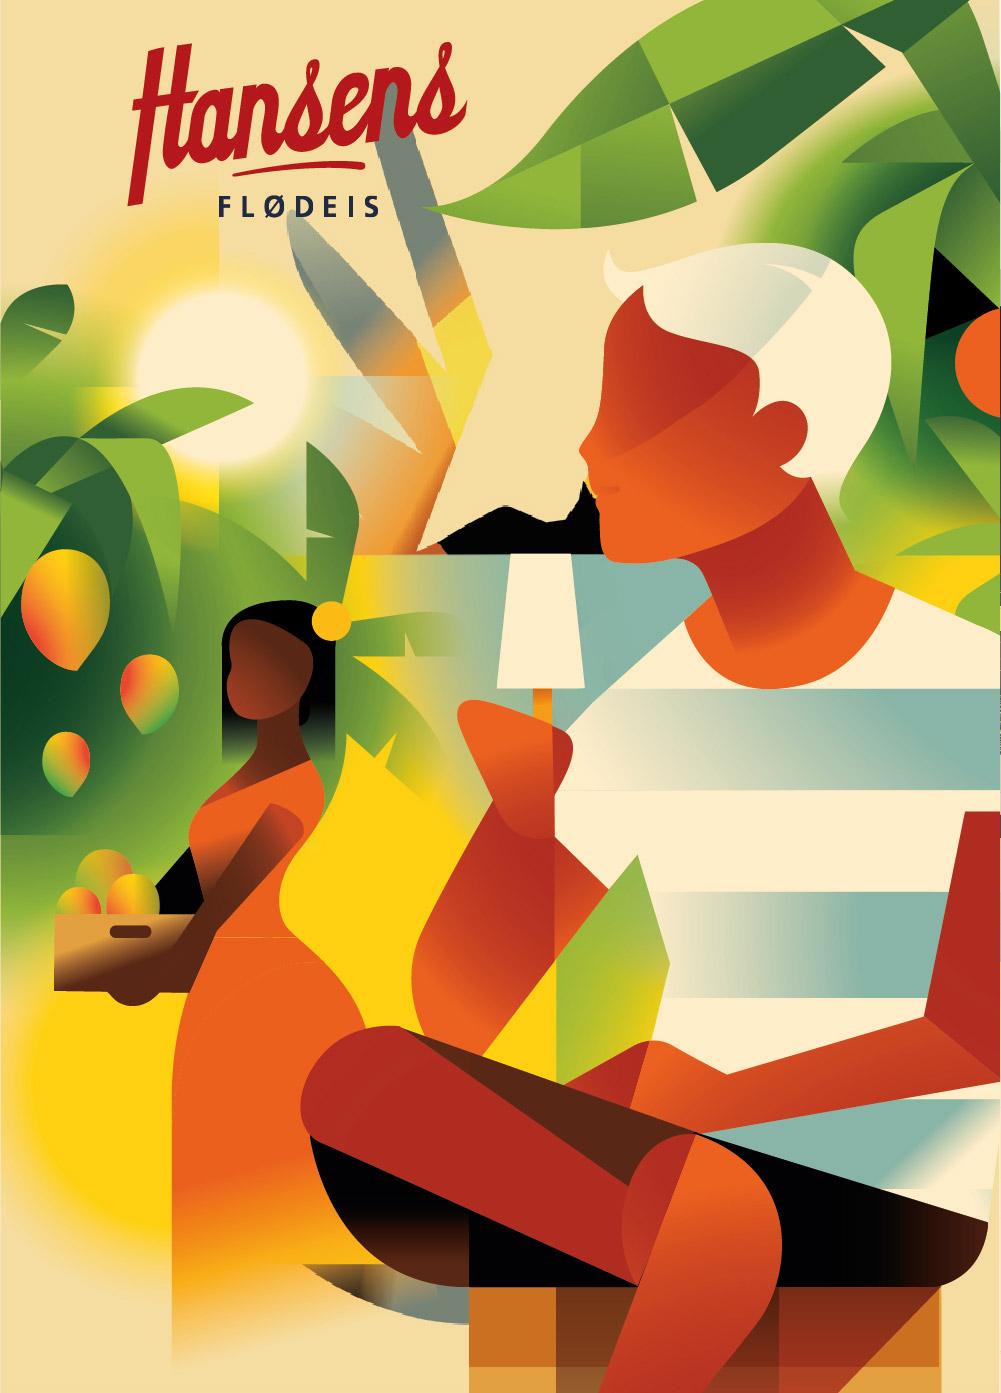 mads-berg-illustrations-09